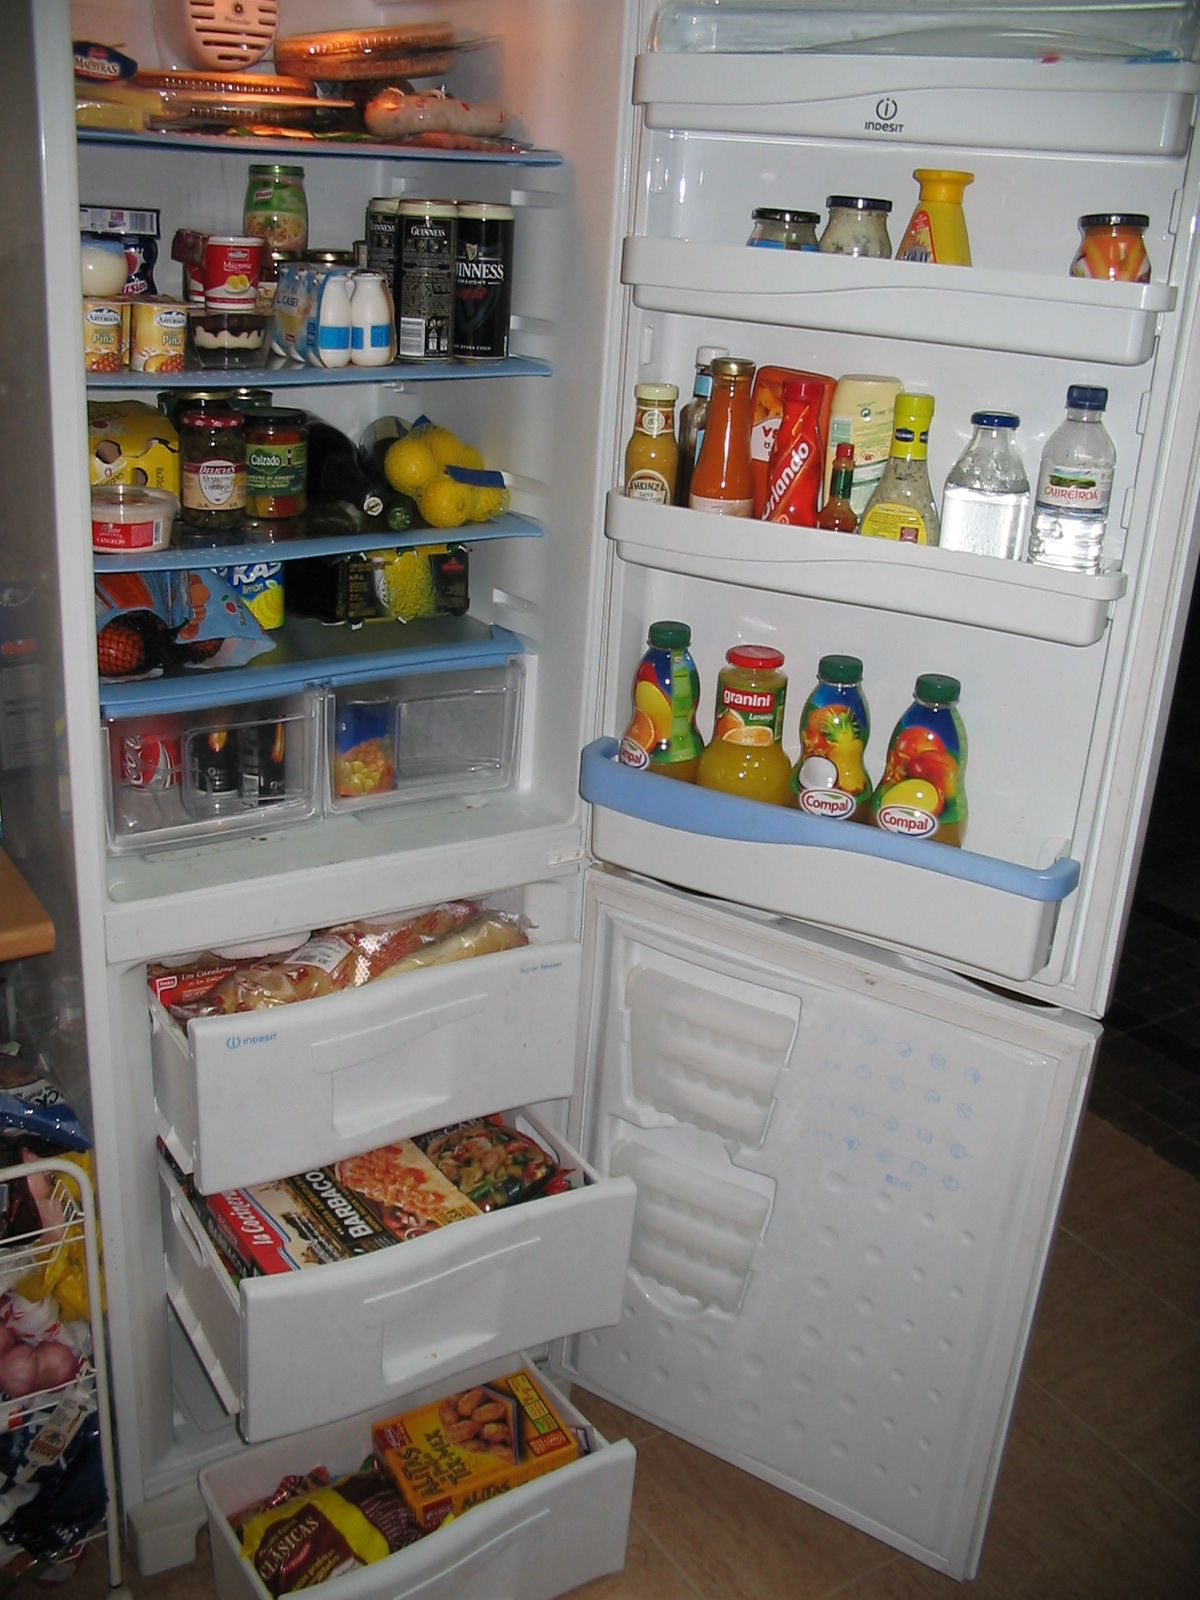 Urgencias para reparación de neveras o frigorificos en Sitges